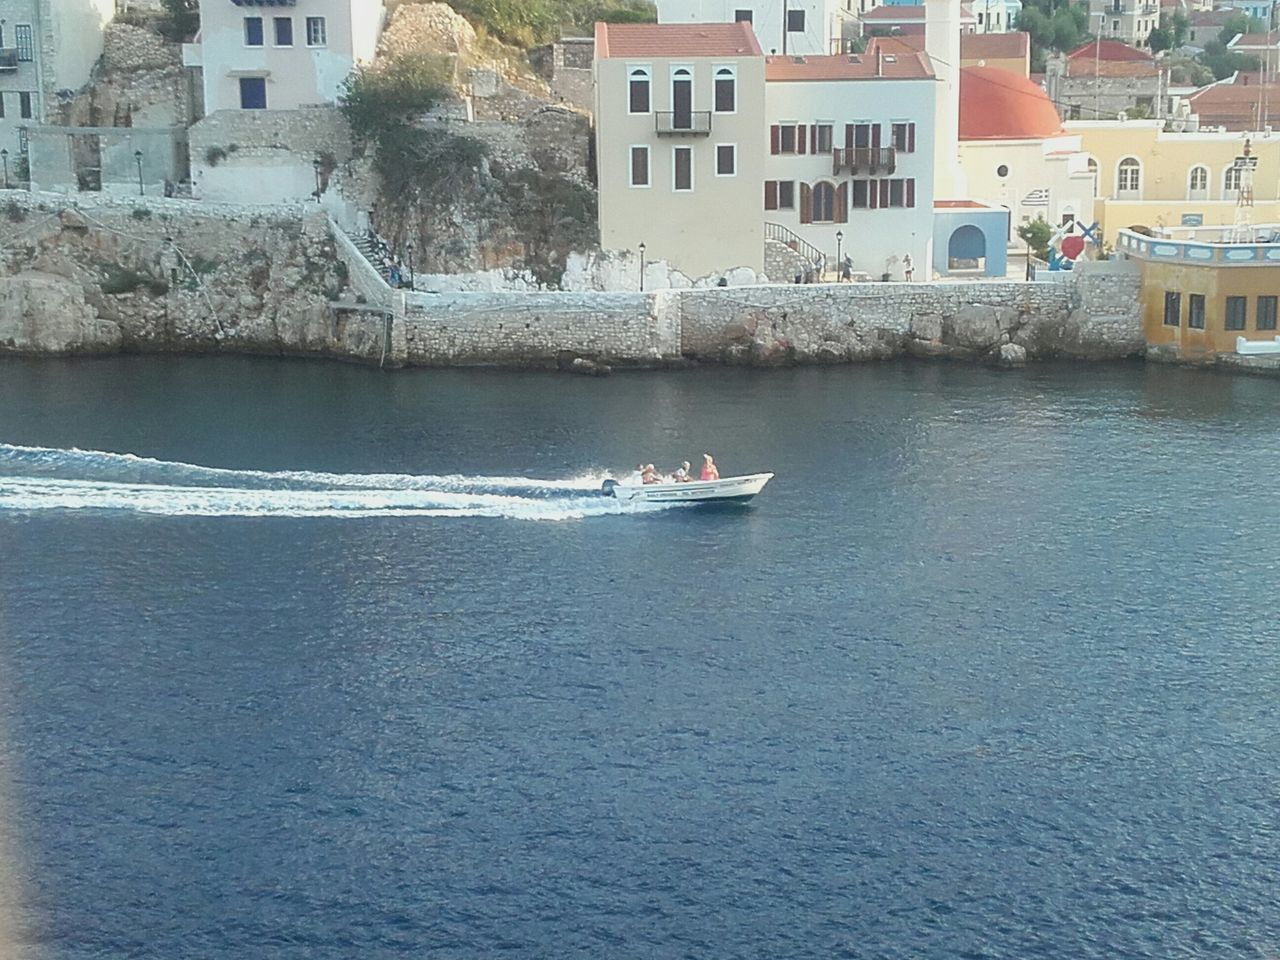 Kastellorizo Boats Boats Boats Taking Photos Speedboat Enjoying Life 450 Inhabitants Beautiful Island